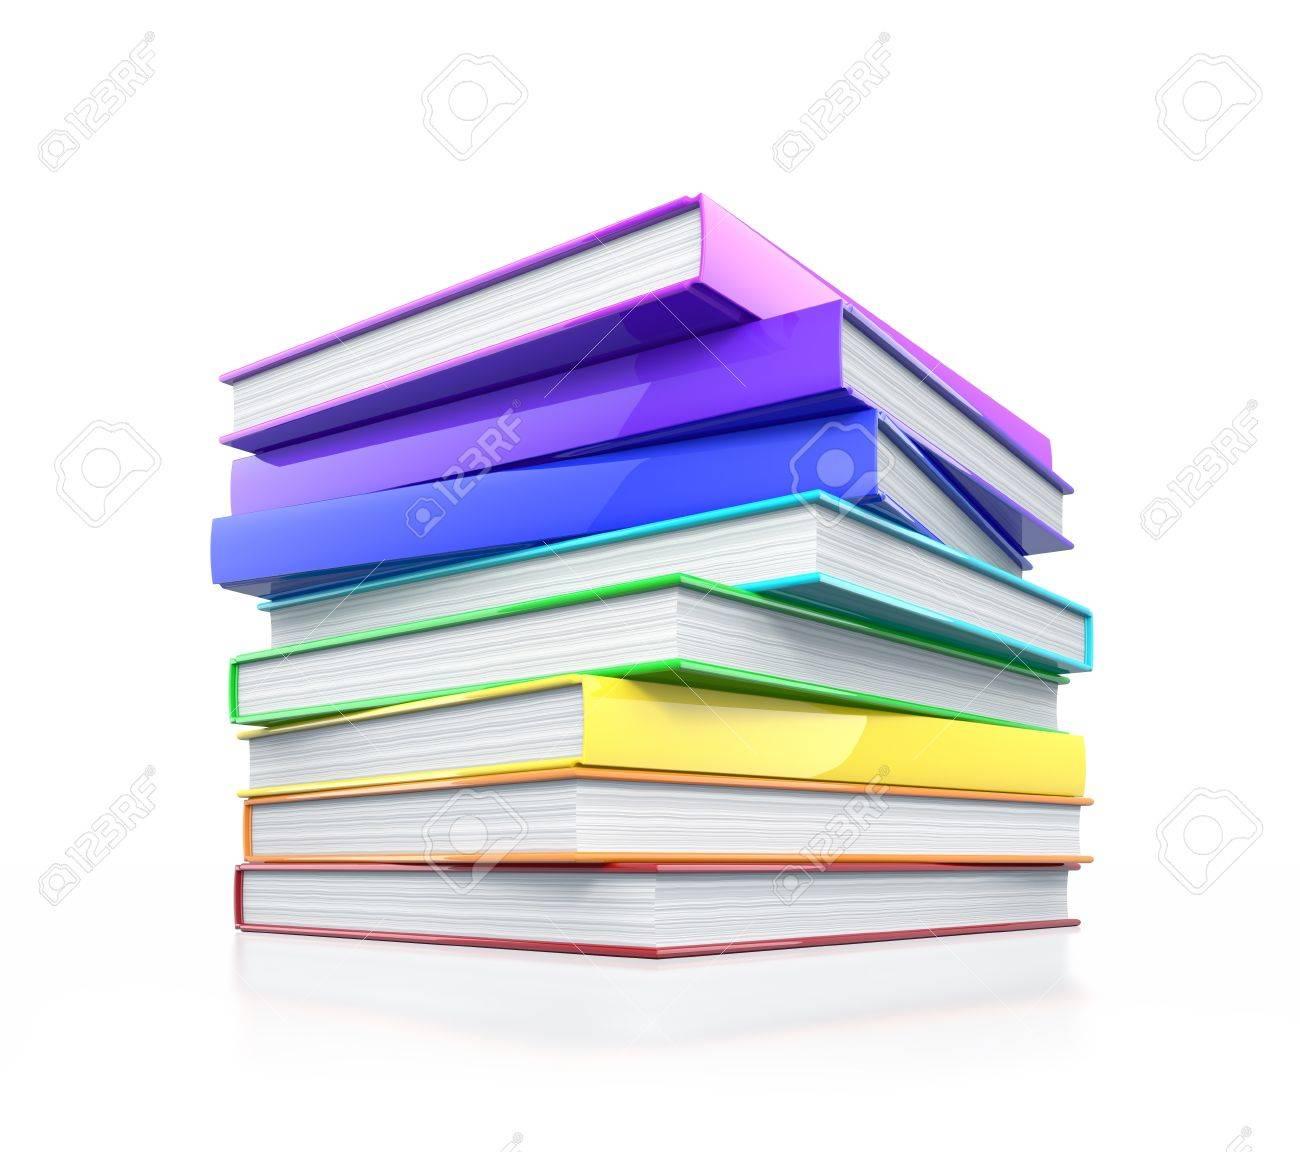 Pila De Libros Coloridos Brillantes. Ilustración De Alta Resolución ...